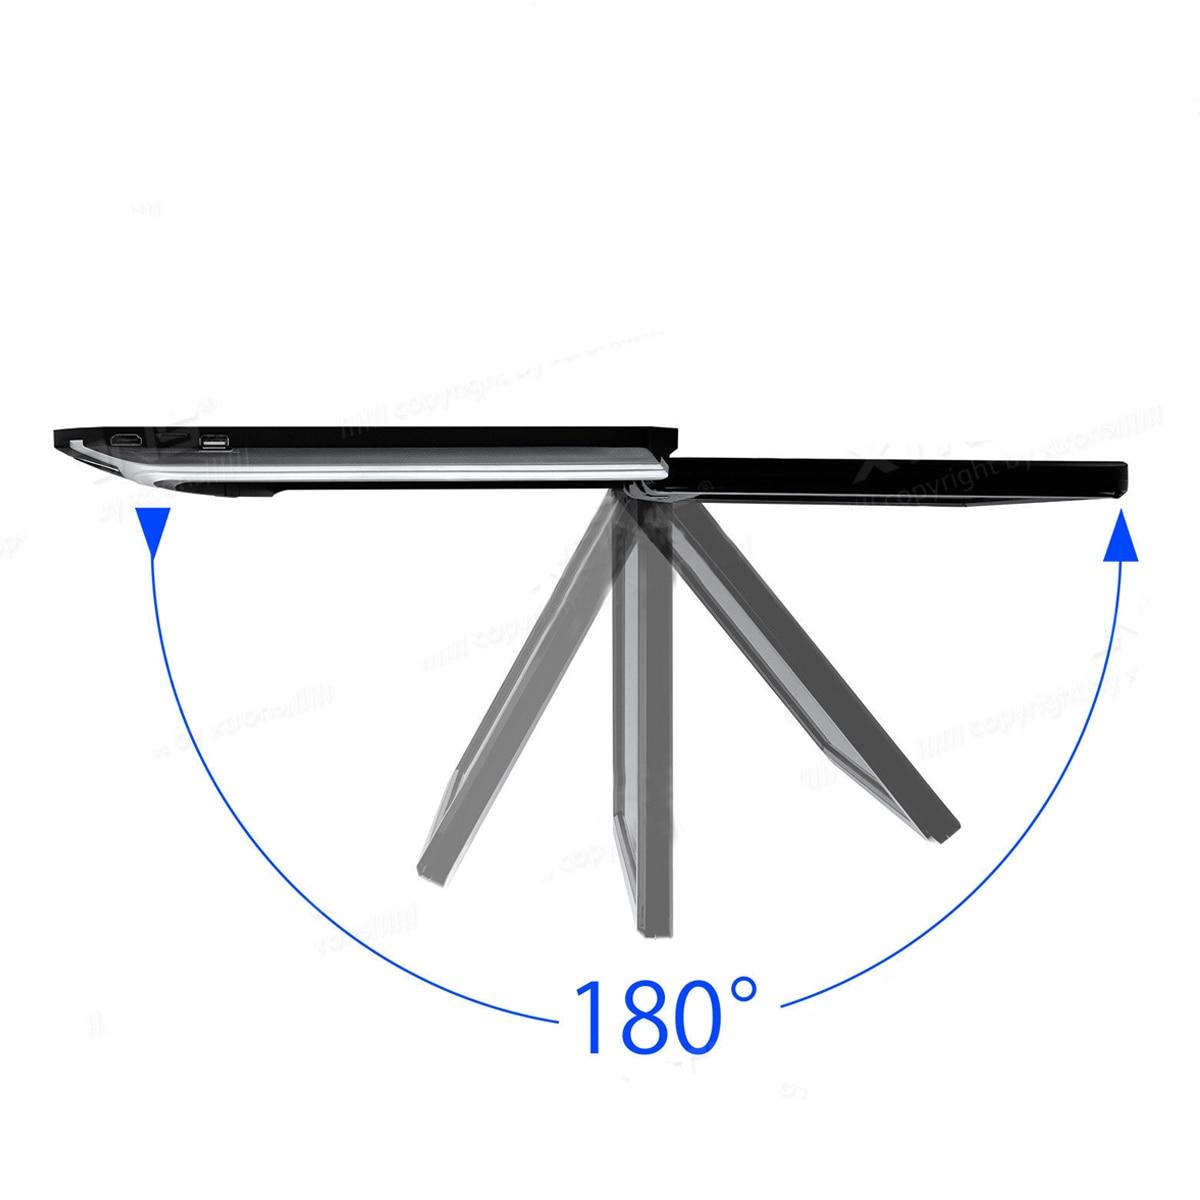 15.6 hd tela larga carro dvd player hdmi teto do carro flip down monitor telhado montagem jogador 1920*1080 - 4